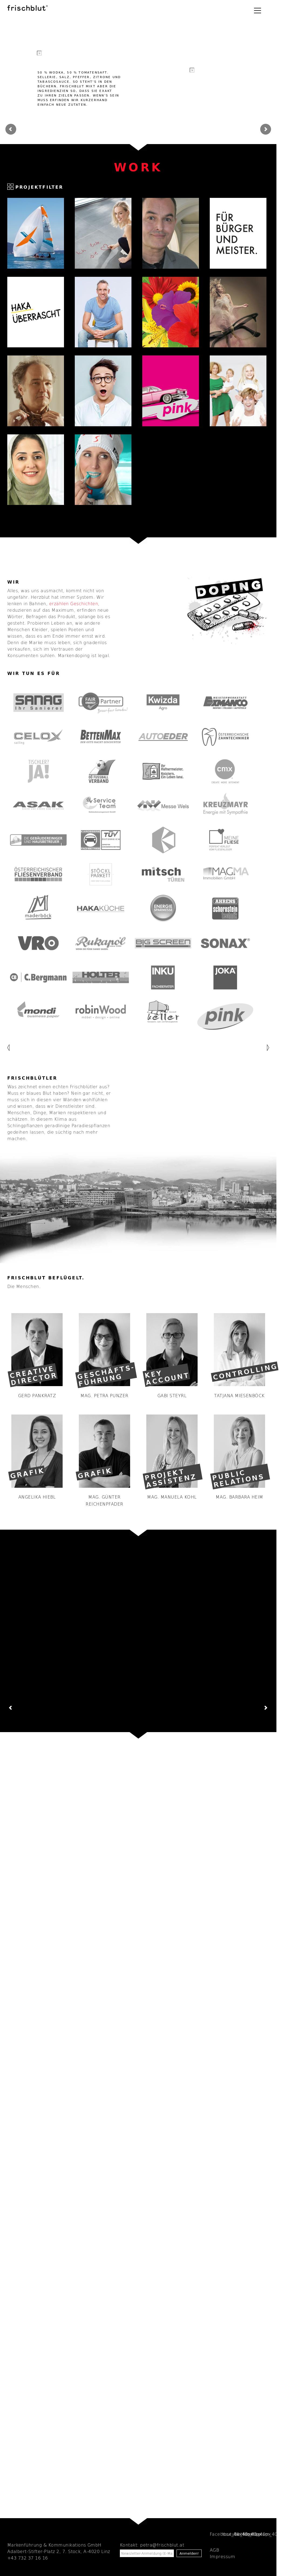 BettenMax Competitors, Revenue and Employees - Owler Company Profile